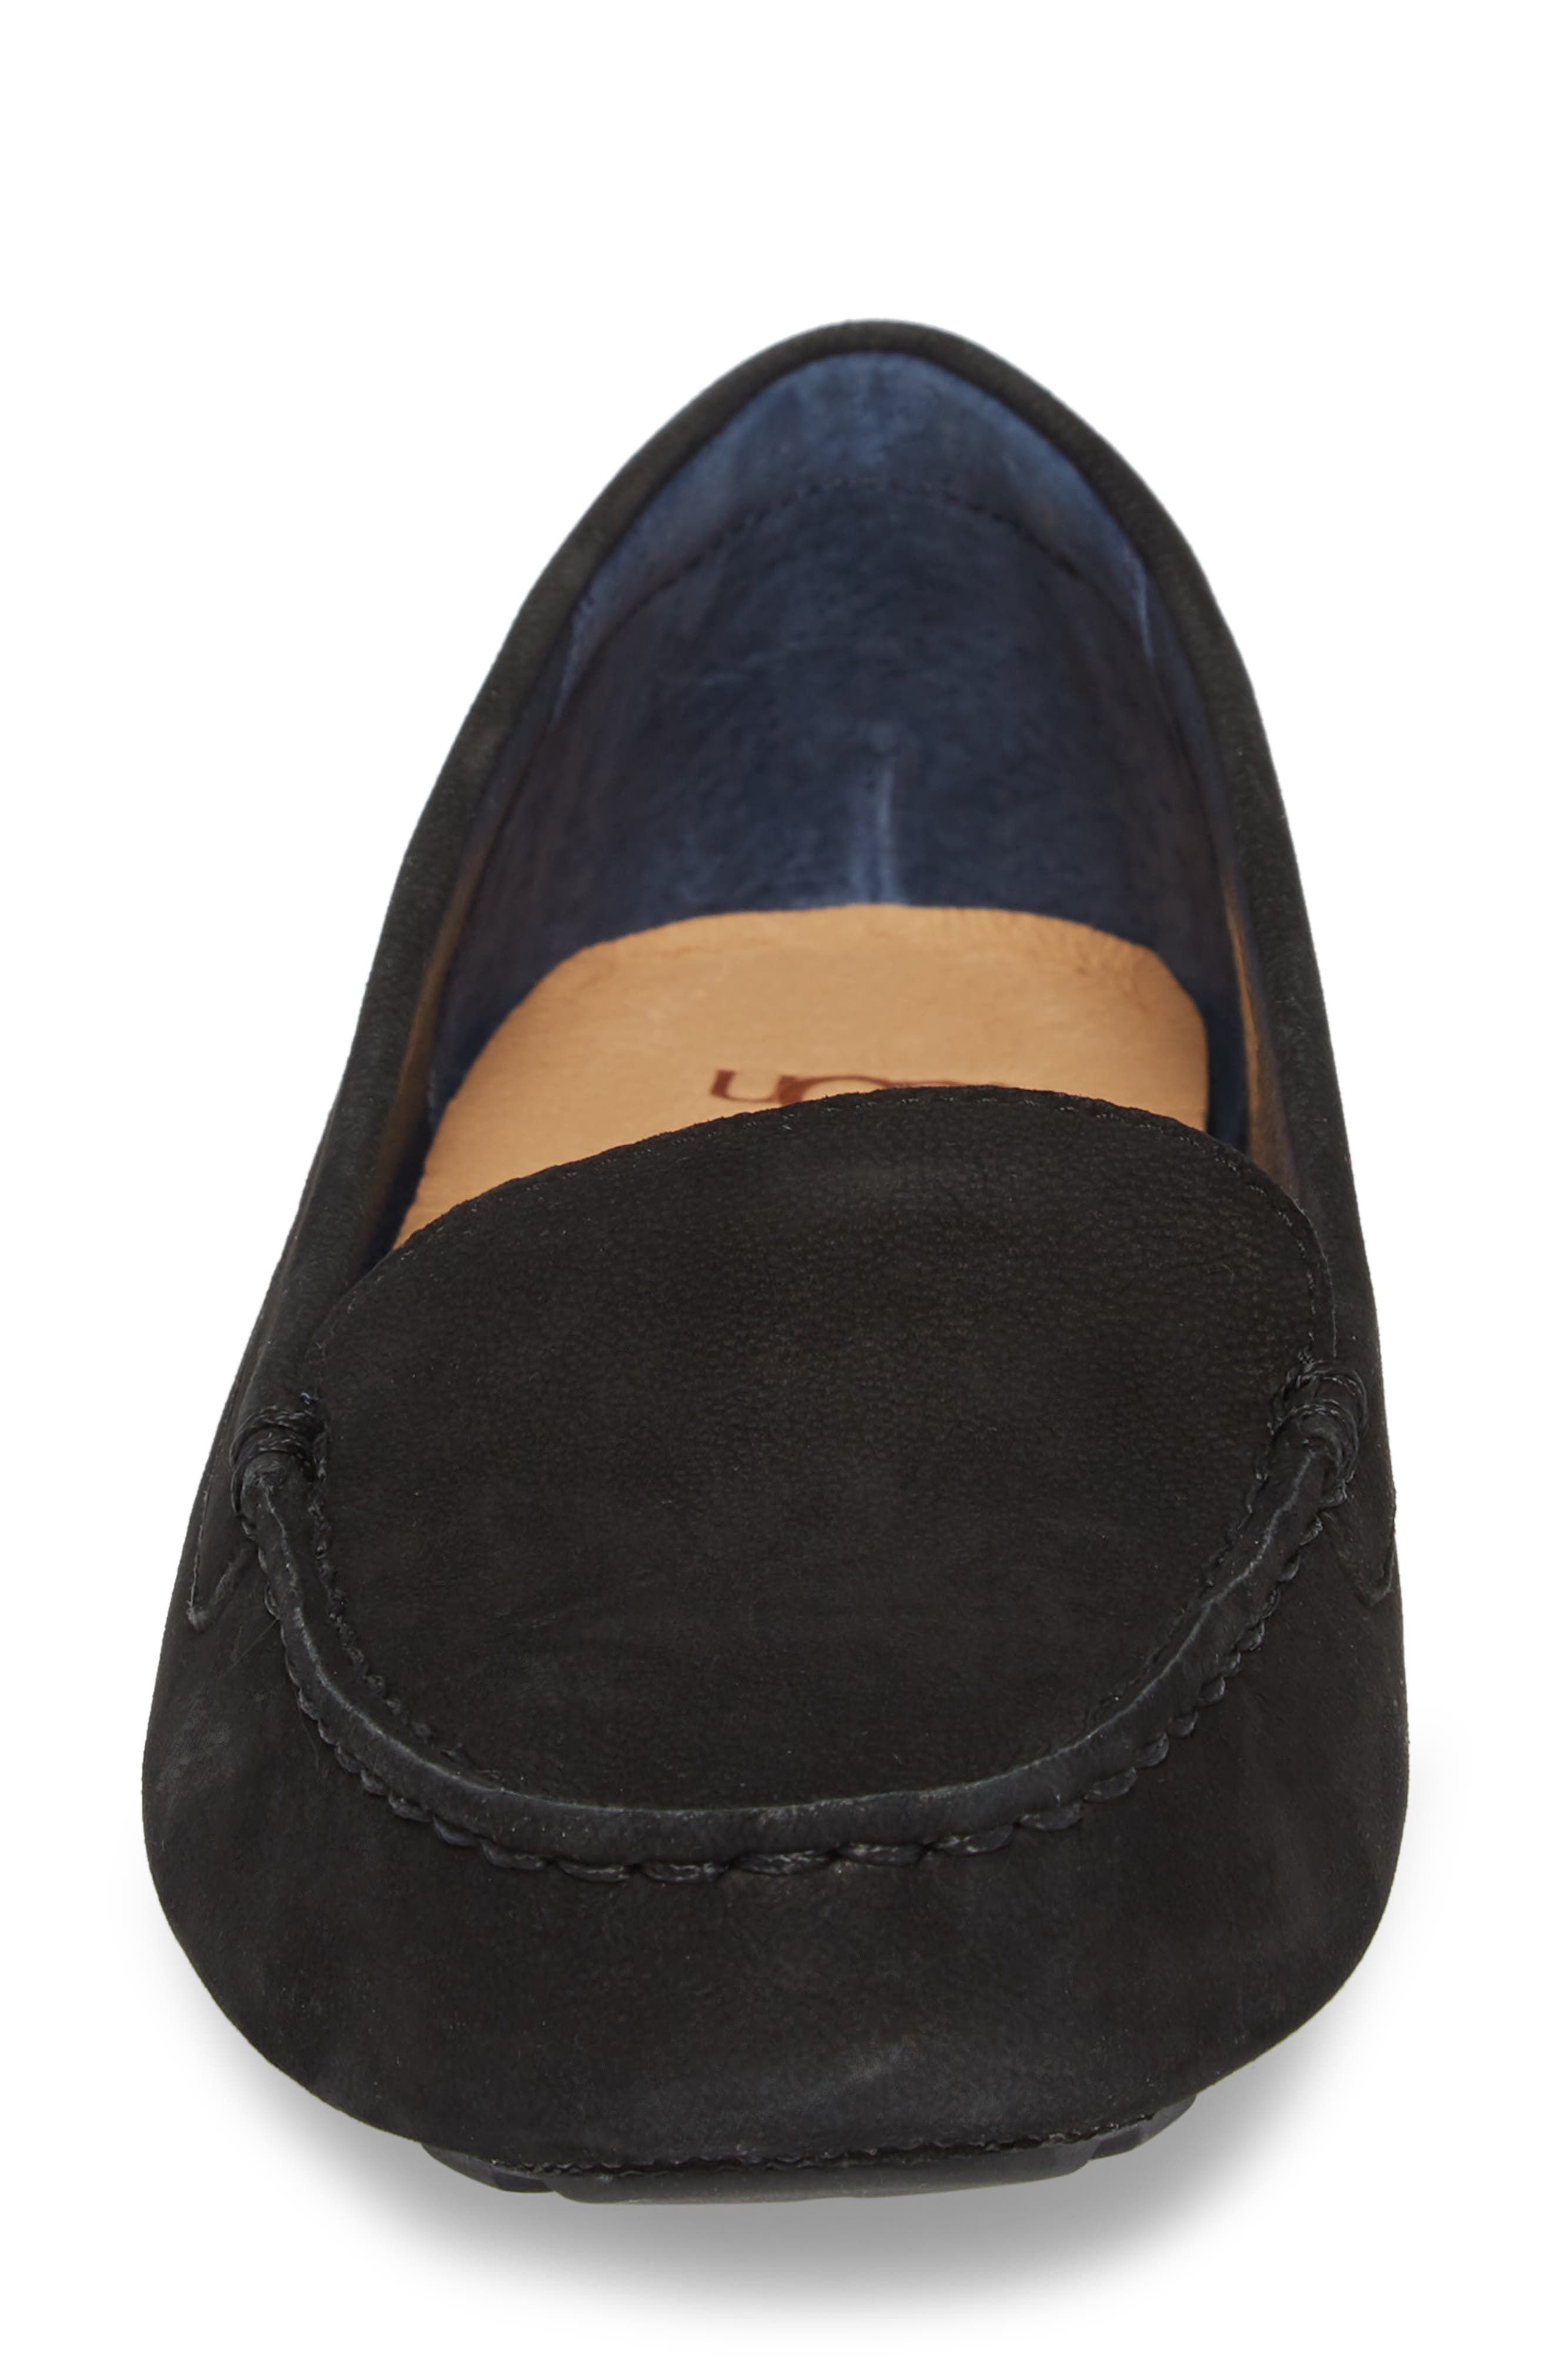 Milana II Moc Toe Flat,                             Alternate thumbnail 4, color,                             001